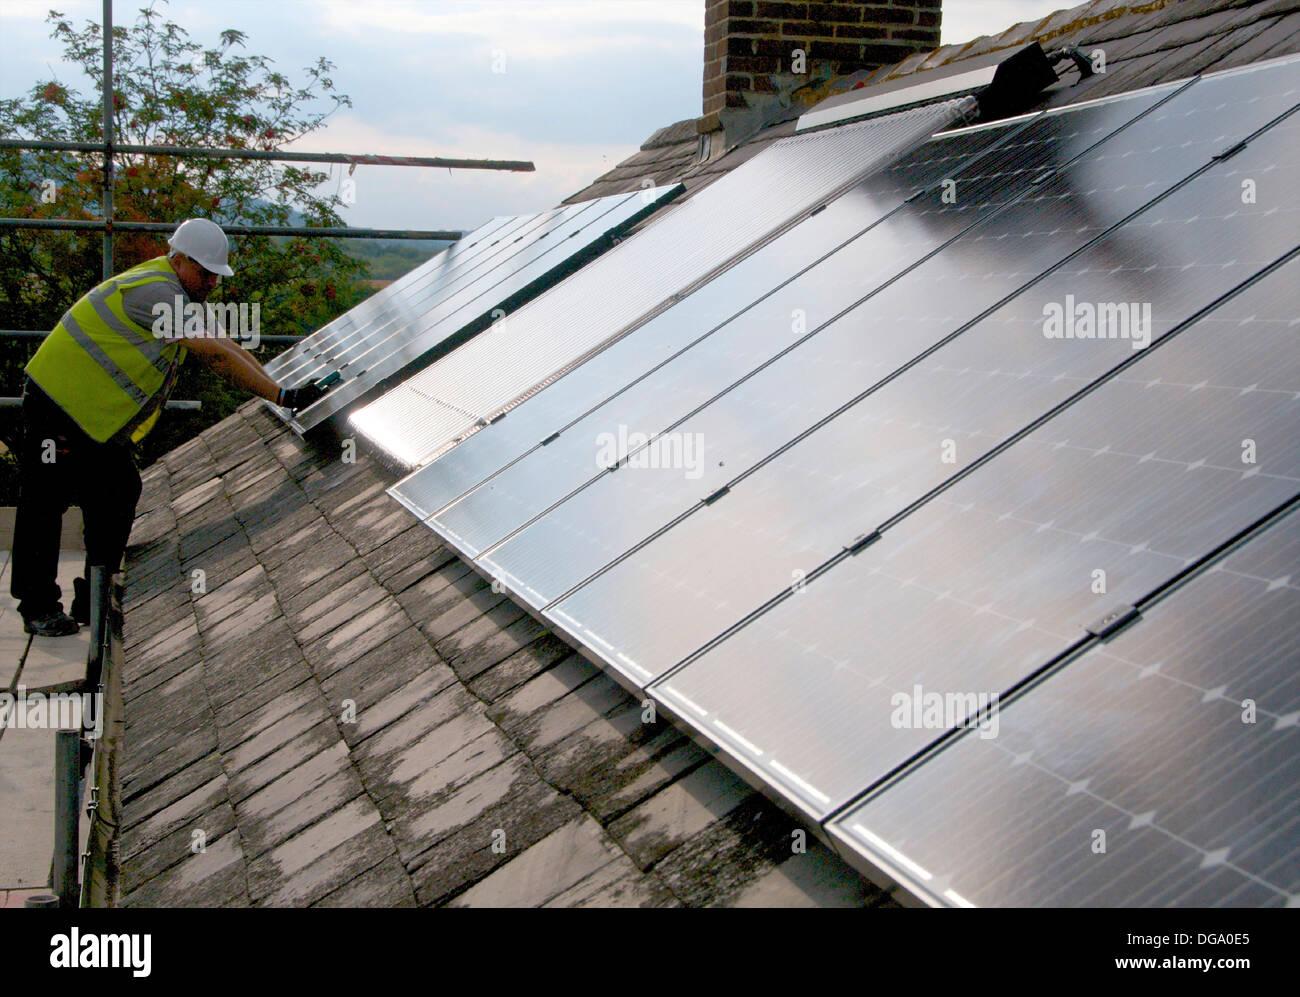 Solar panels photovoltaic generate electrcity Stock Photo